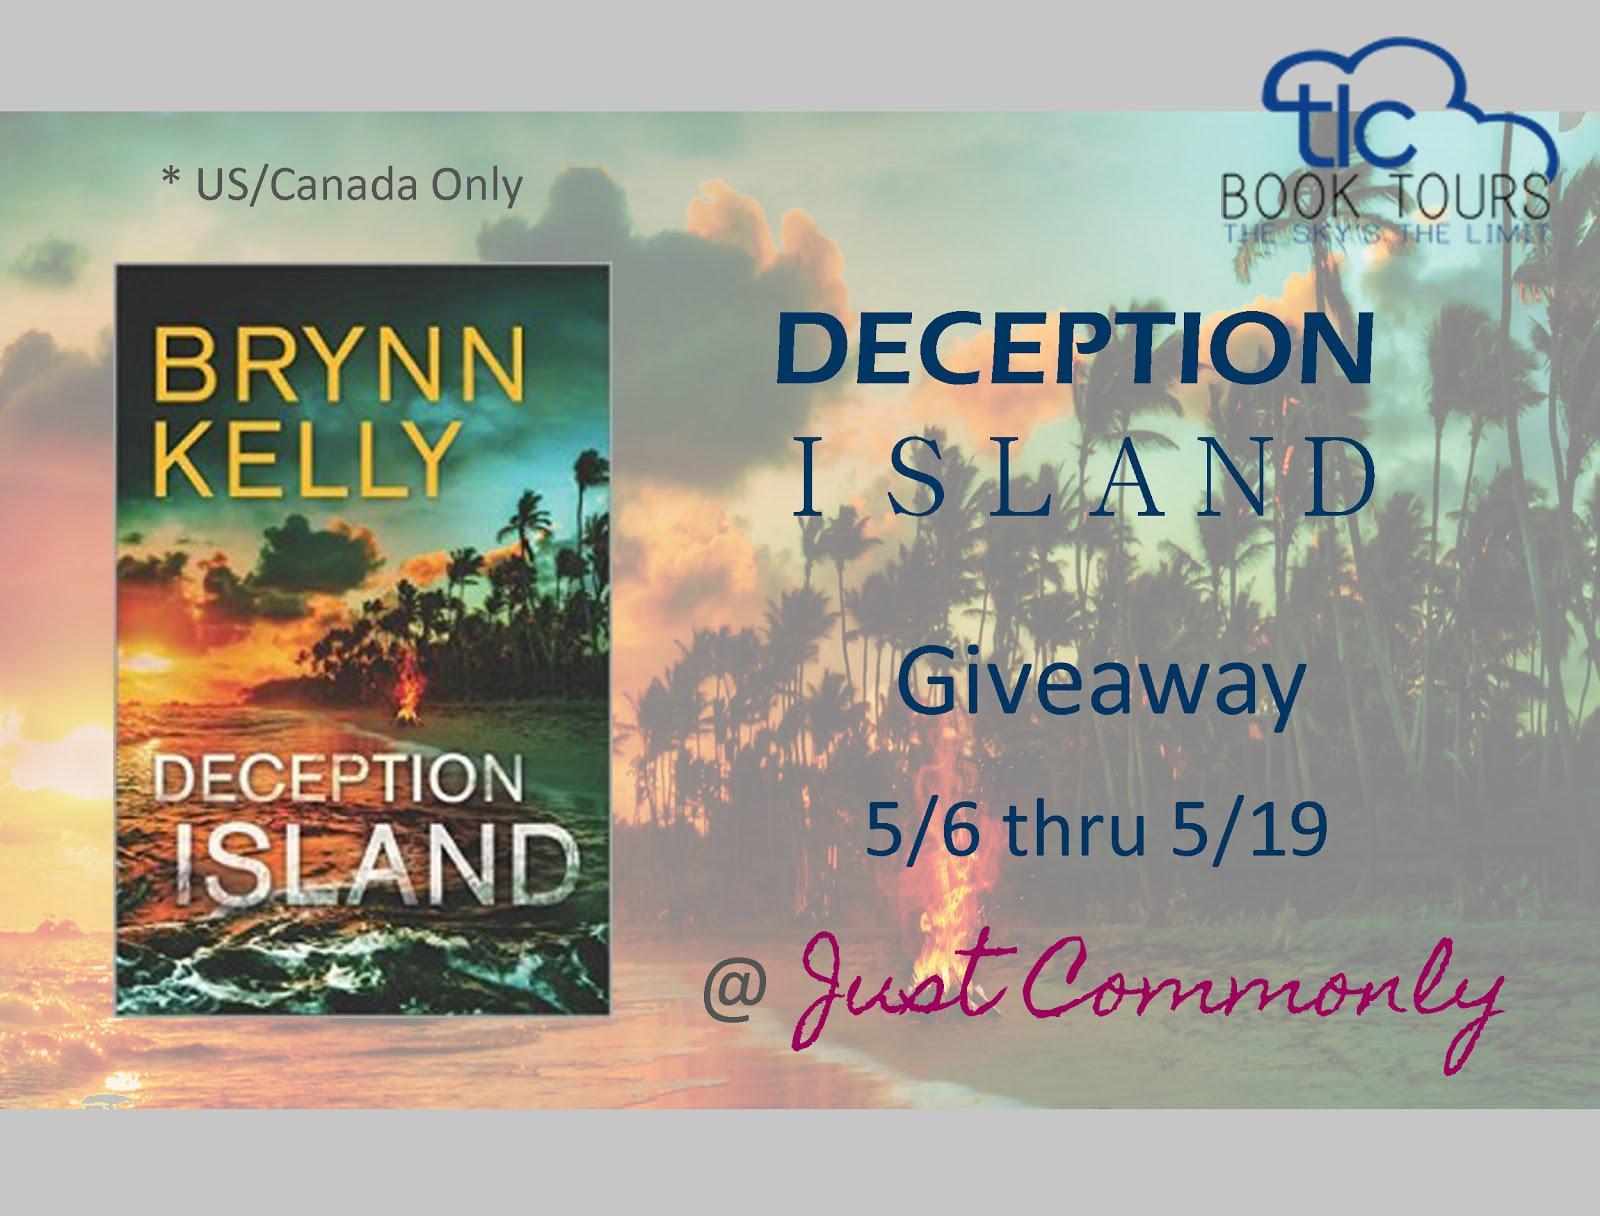 Deception Island Giveaway thru 5/19